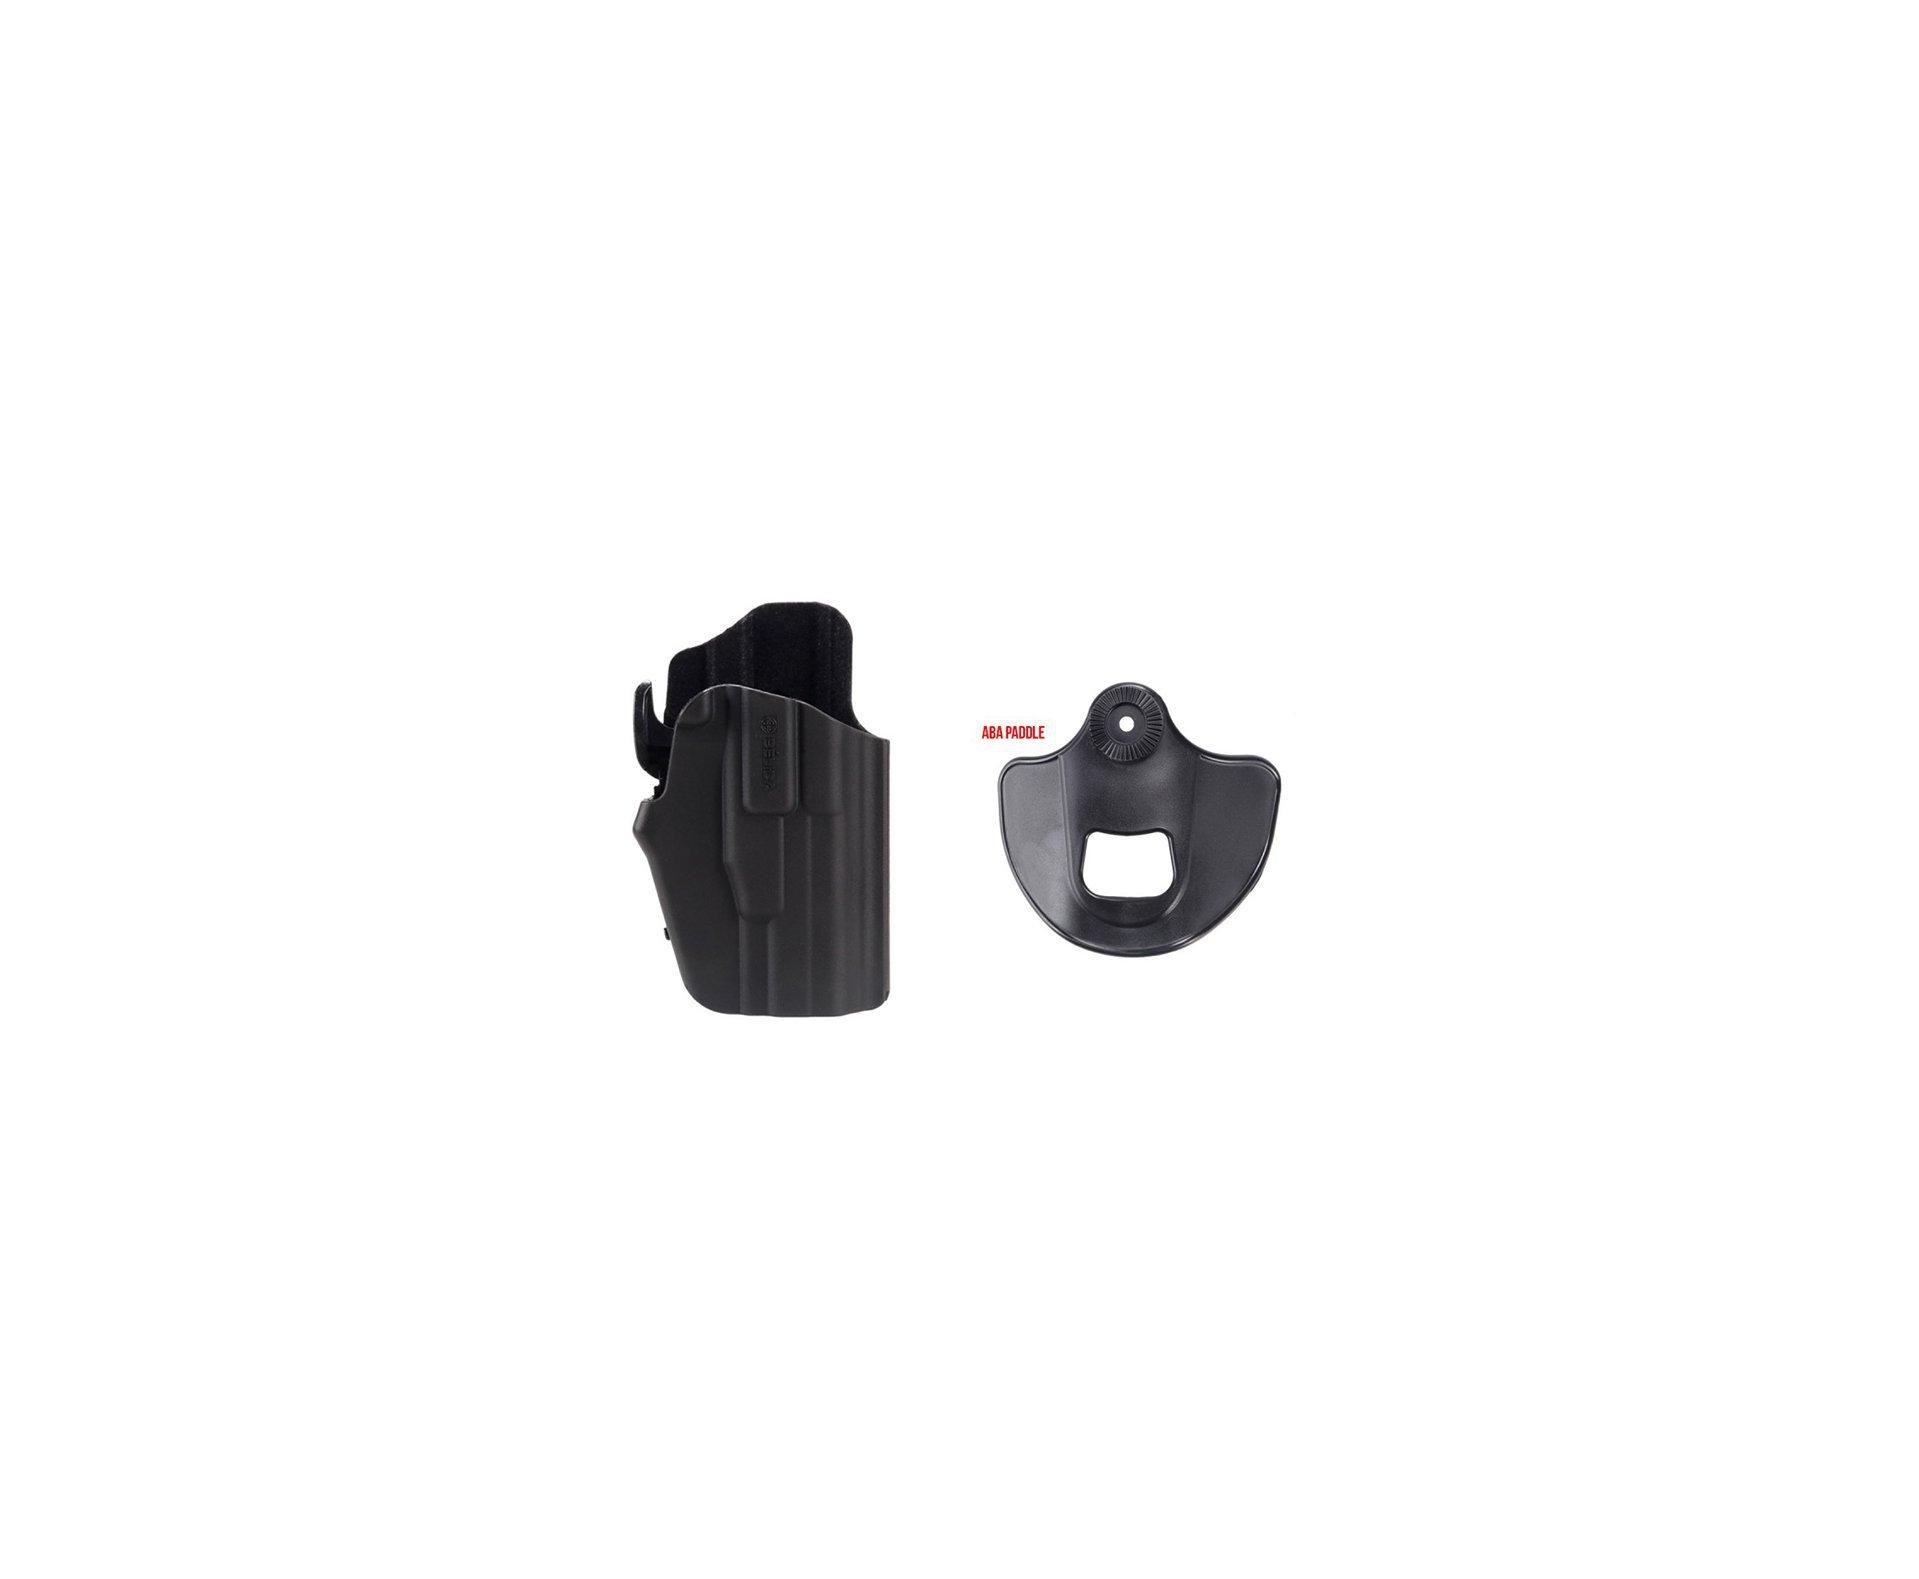 Coldre Evolution I Pistola Taurus, Glock, Whalter, H&k, S&w  Com Adaptador Paddle Destro - Belica